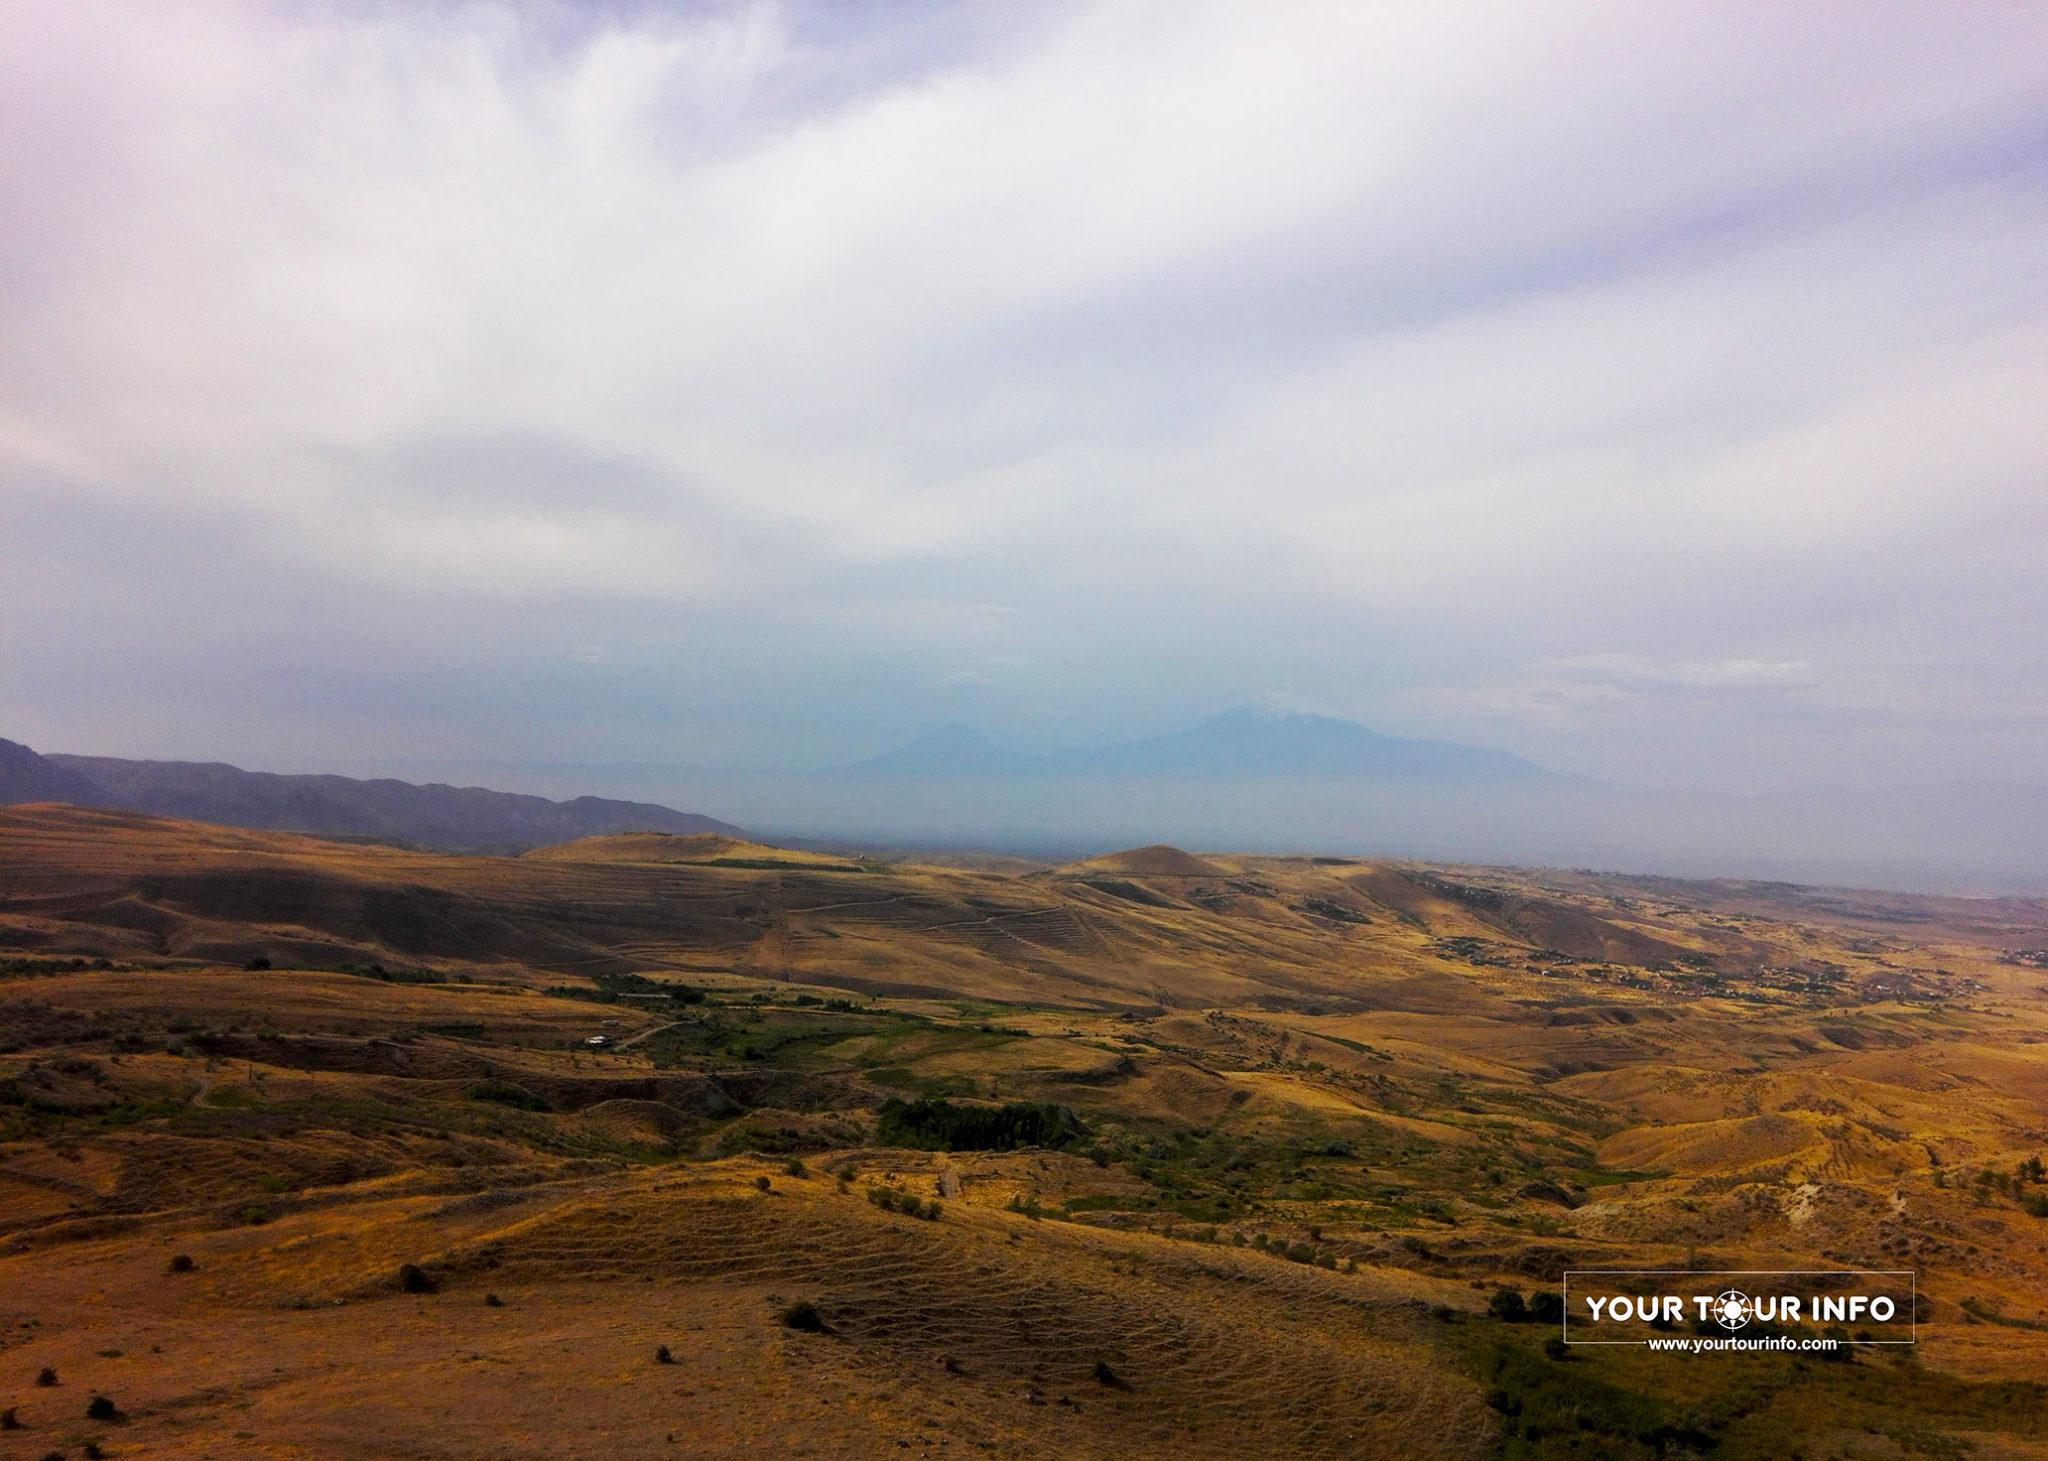 Ararat Mountain from Charents Arch, Armenia